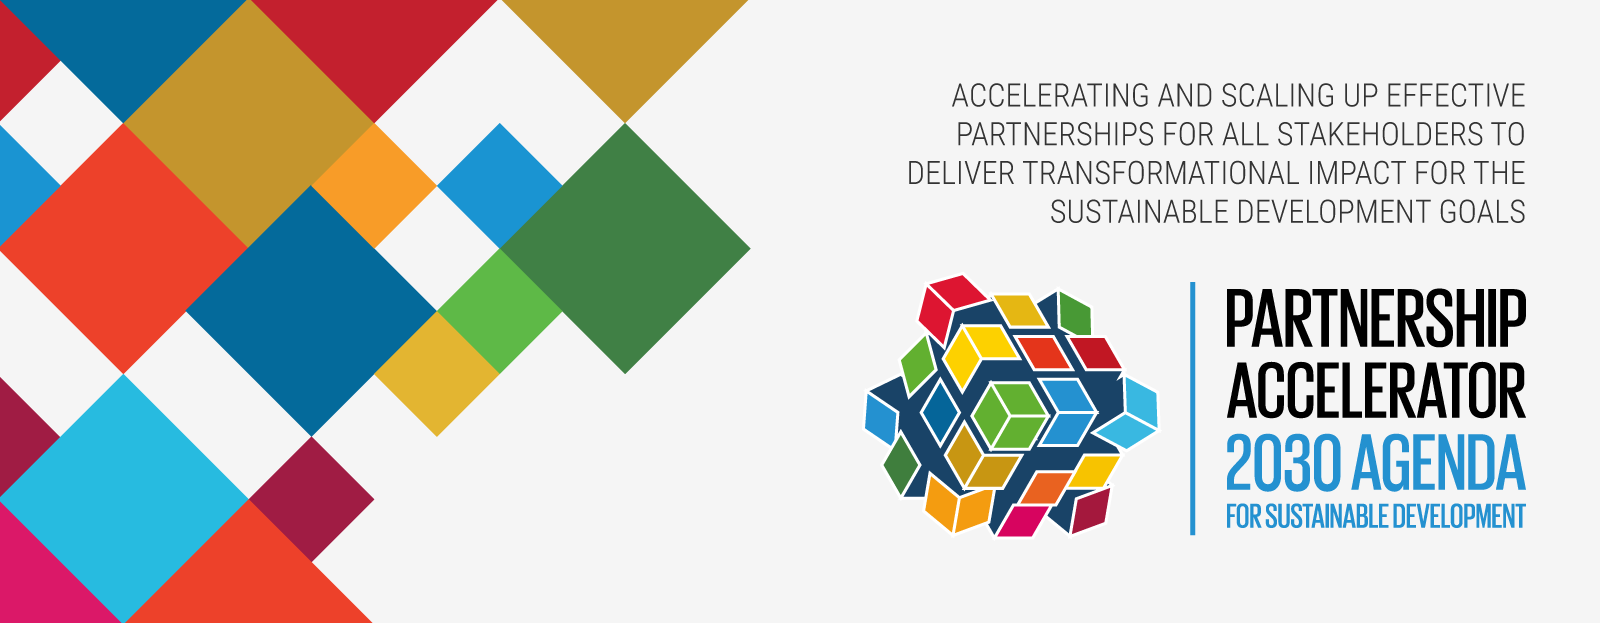 2030 Agenda Partnership Accelerator